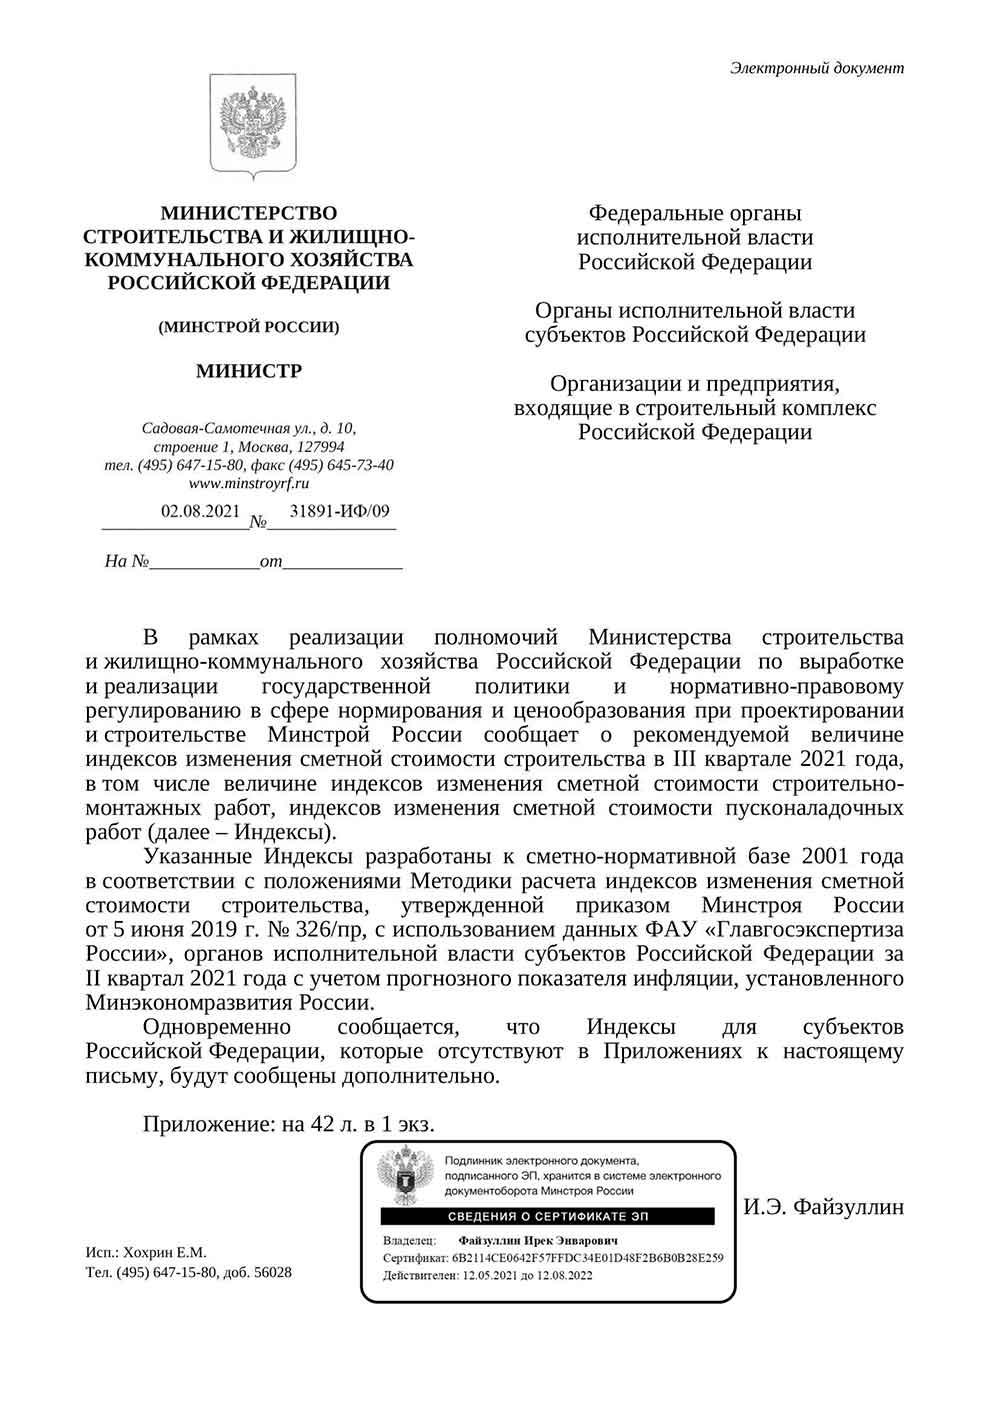 Письмо Минстроя РФ №31891-ИФ/09 от 02.08.2021 г.